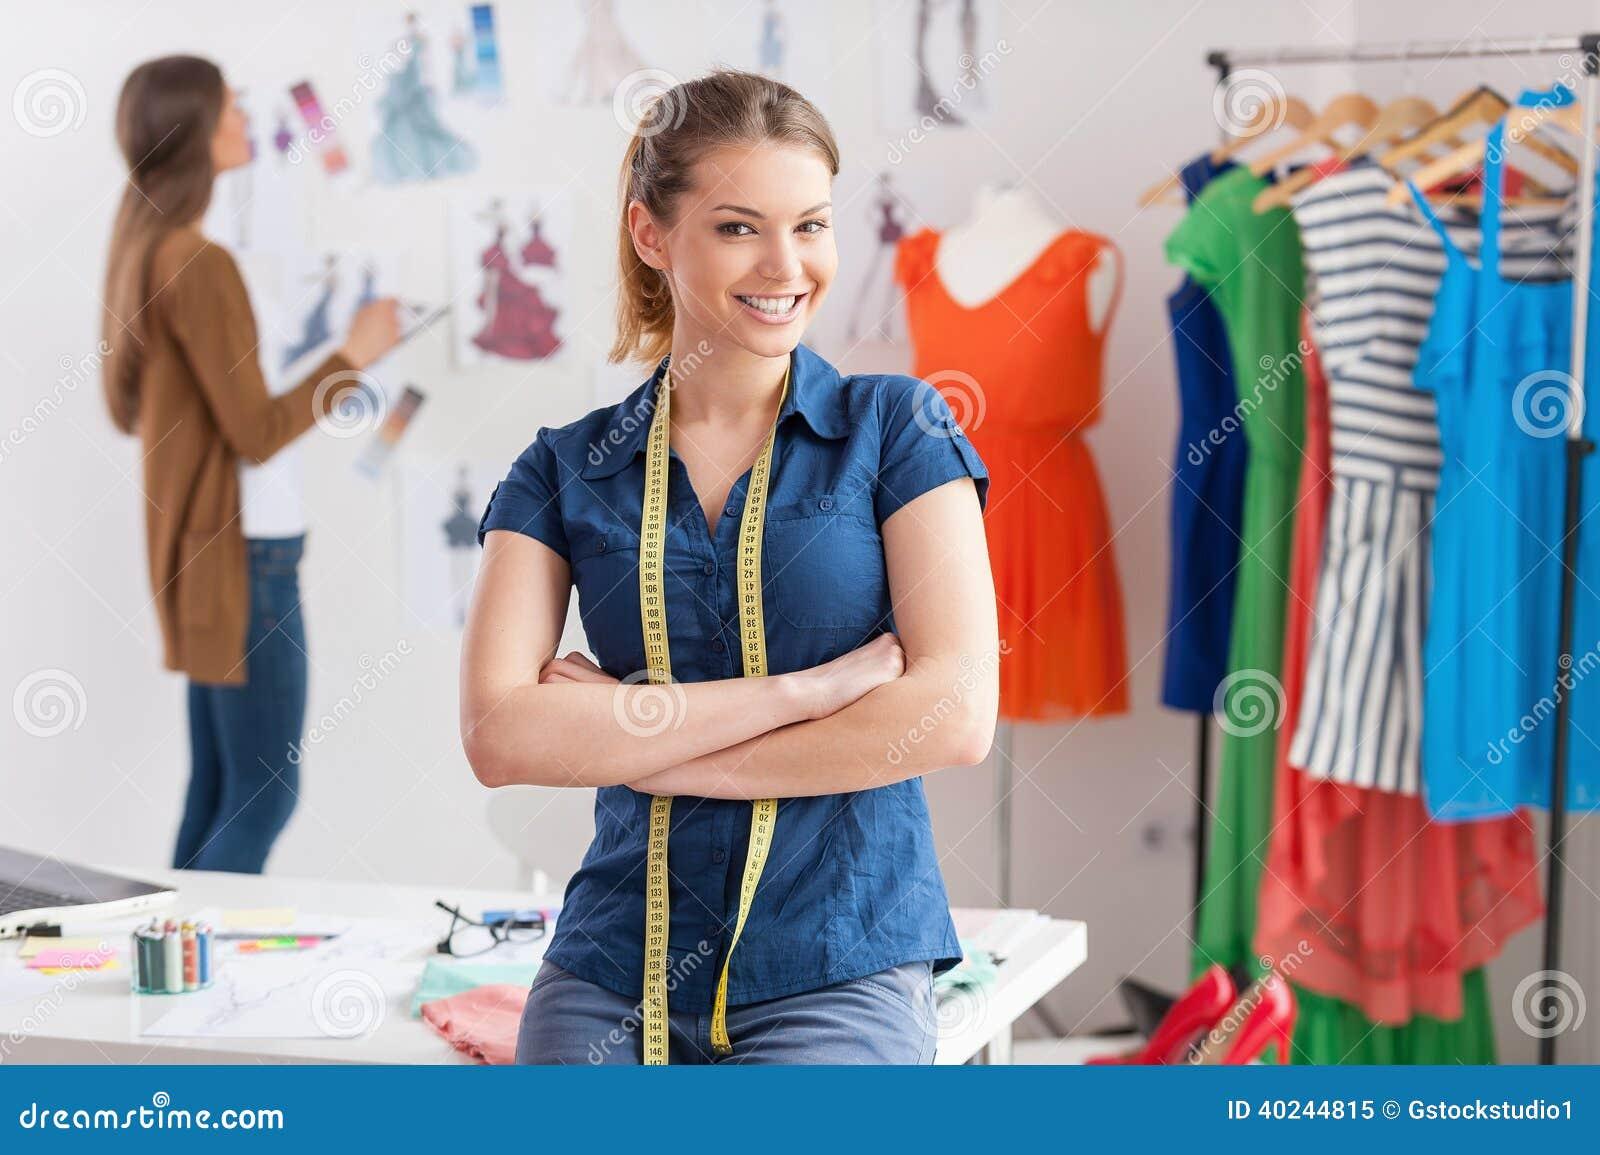 fashion designers at work stock image image of adult 40244815fashion designers at work